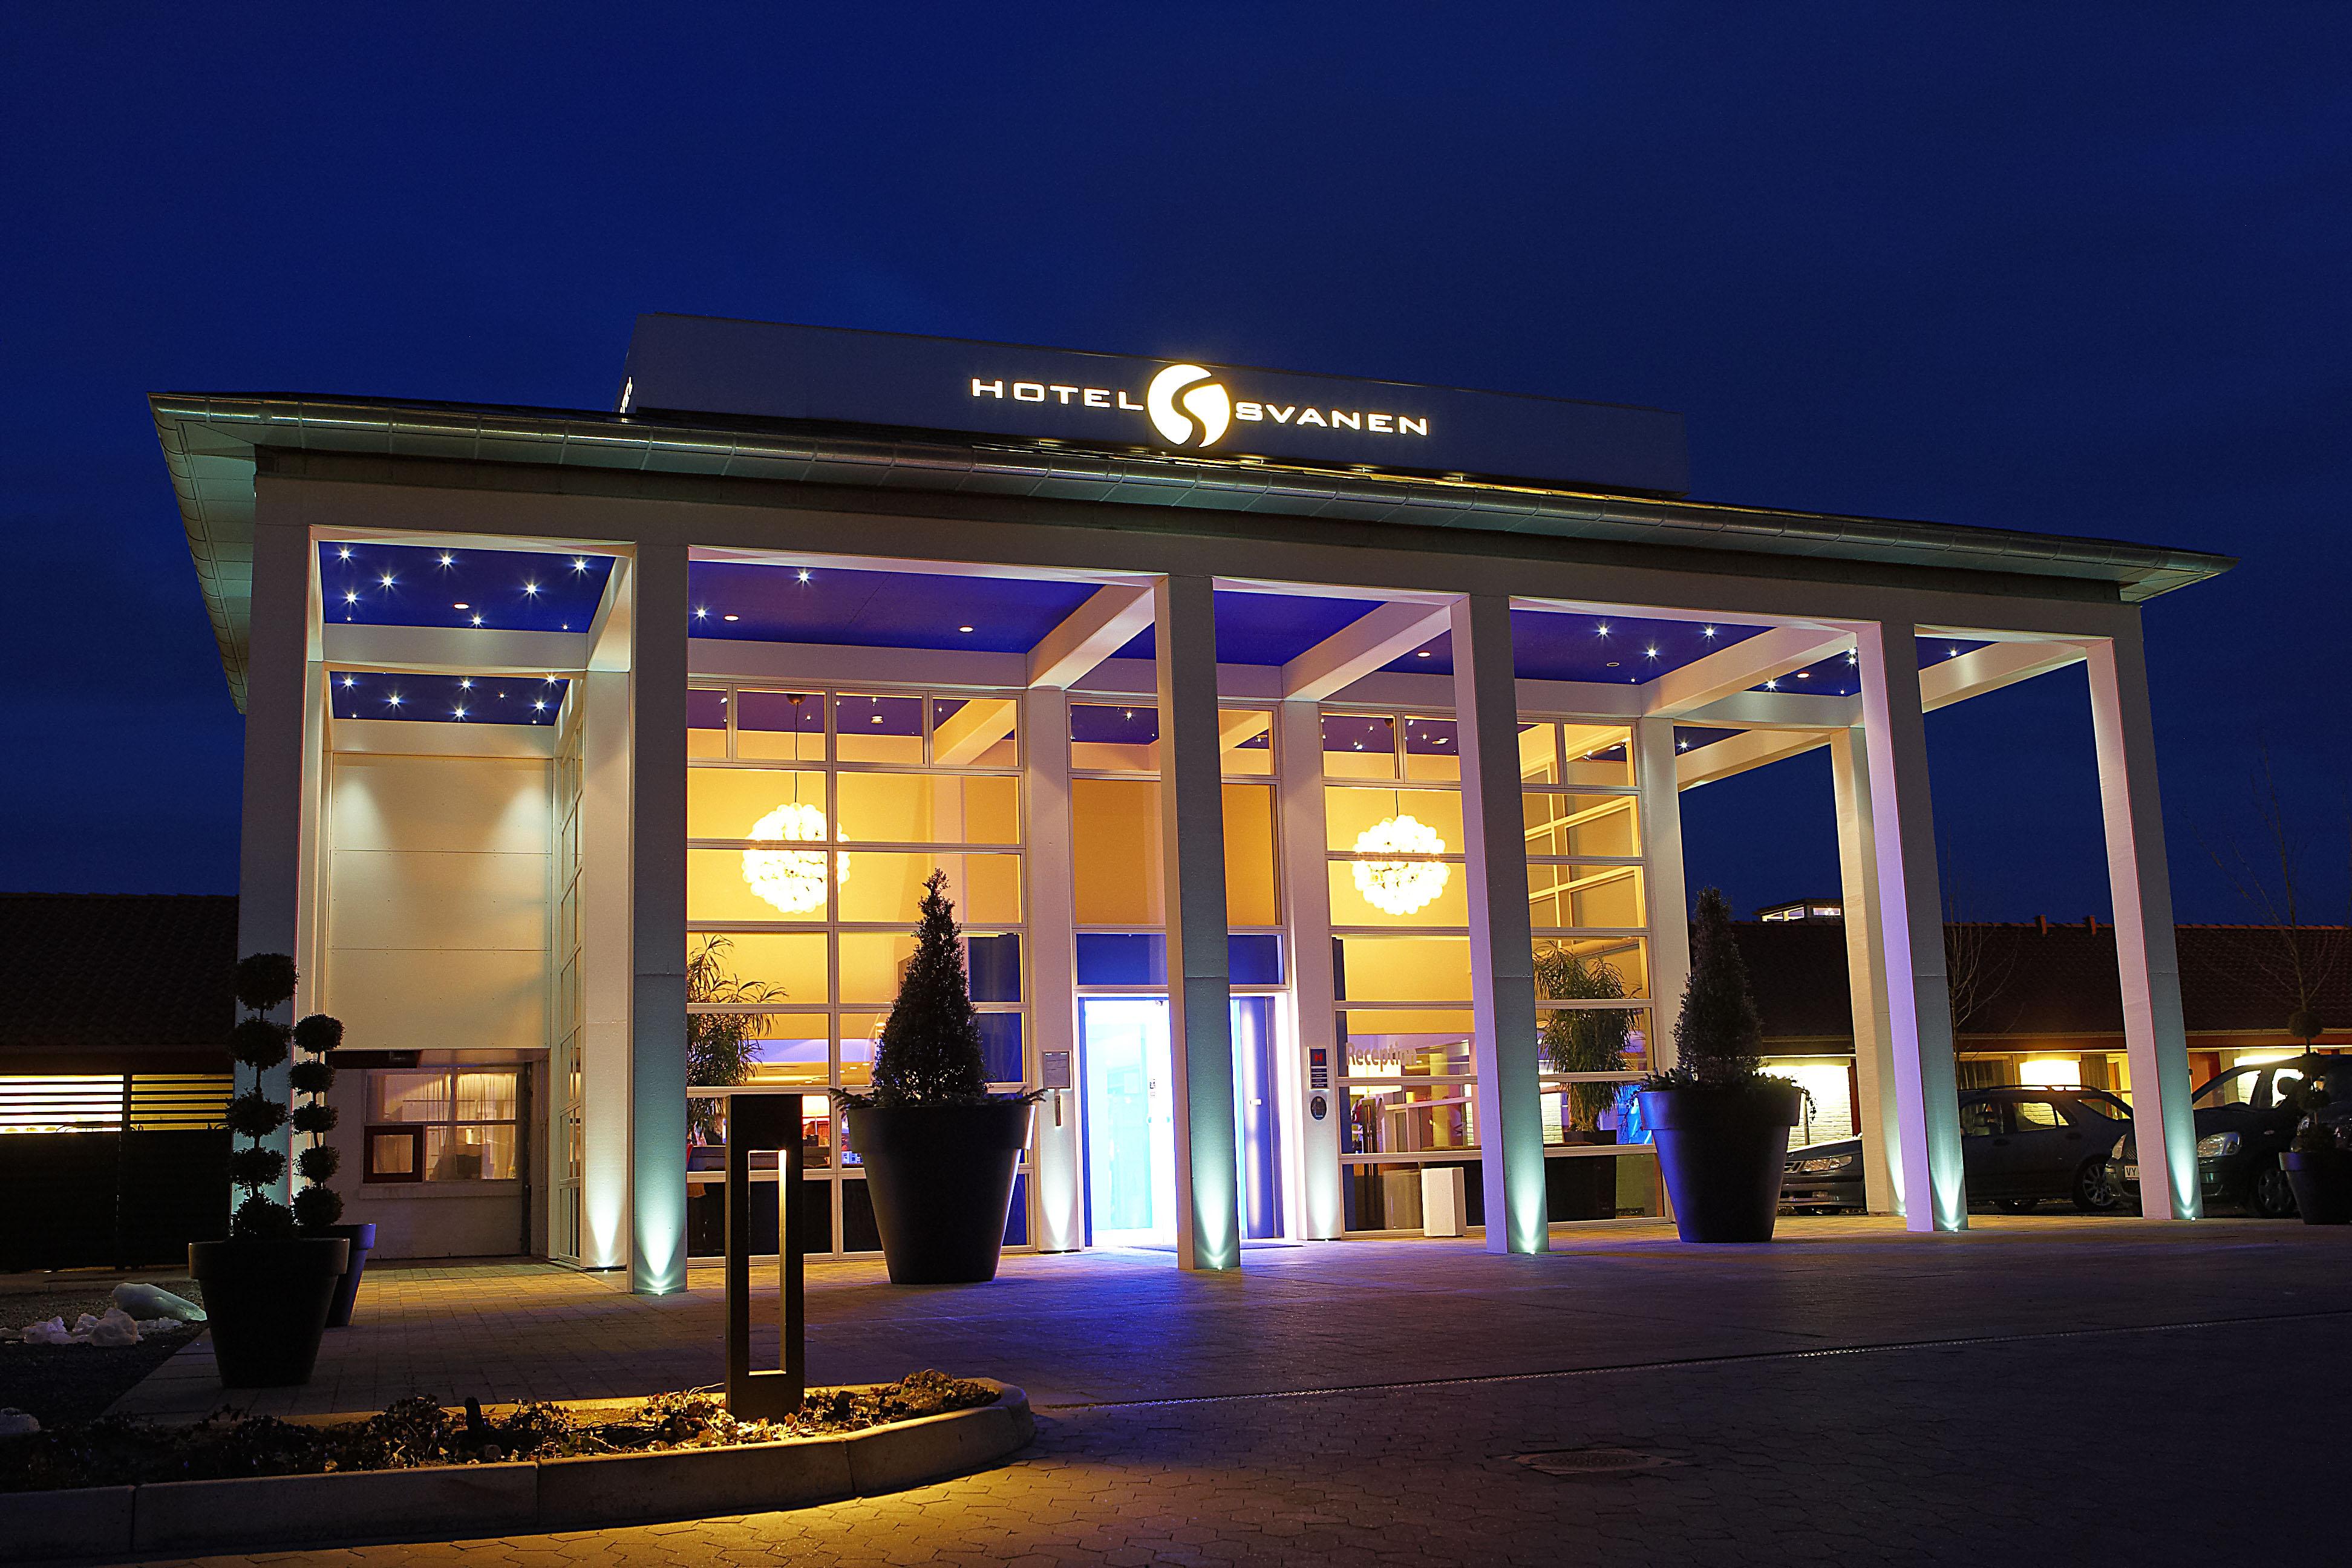 Hotel svanen billund i g afstand fra legoland for Familien designhotel